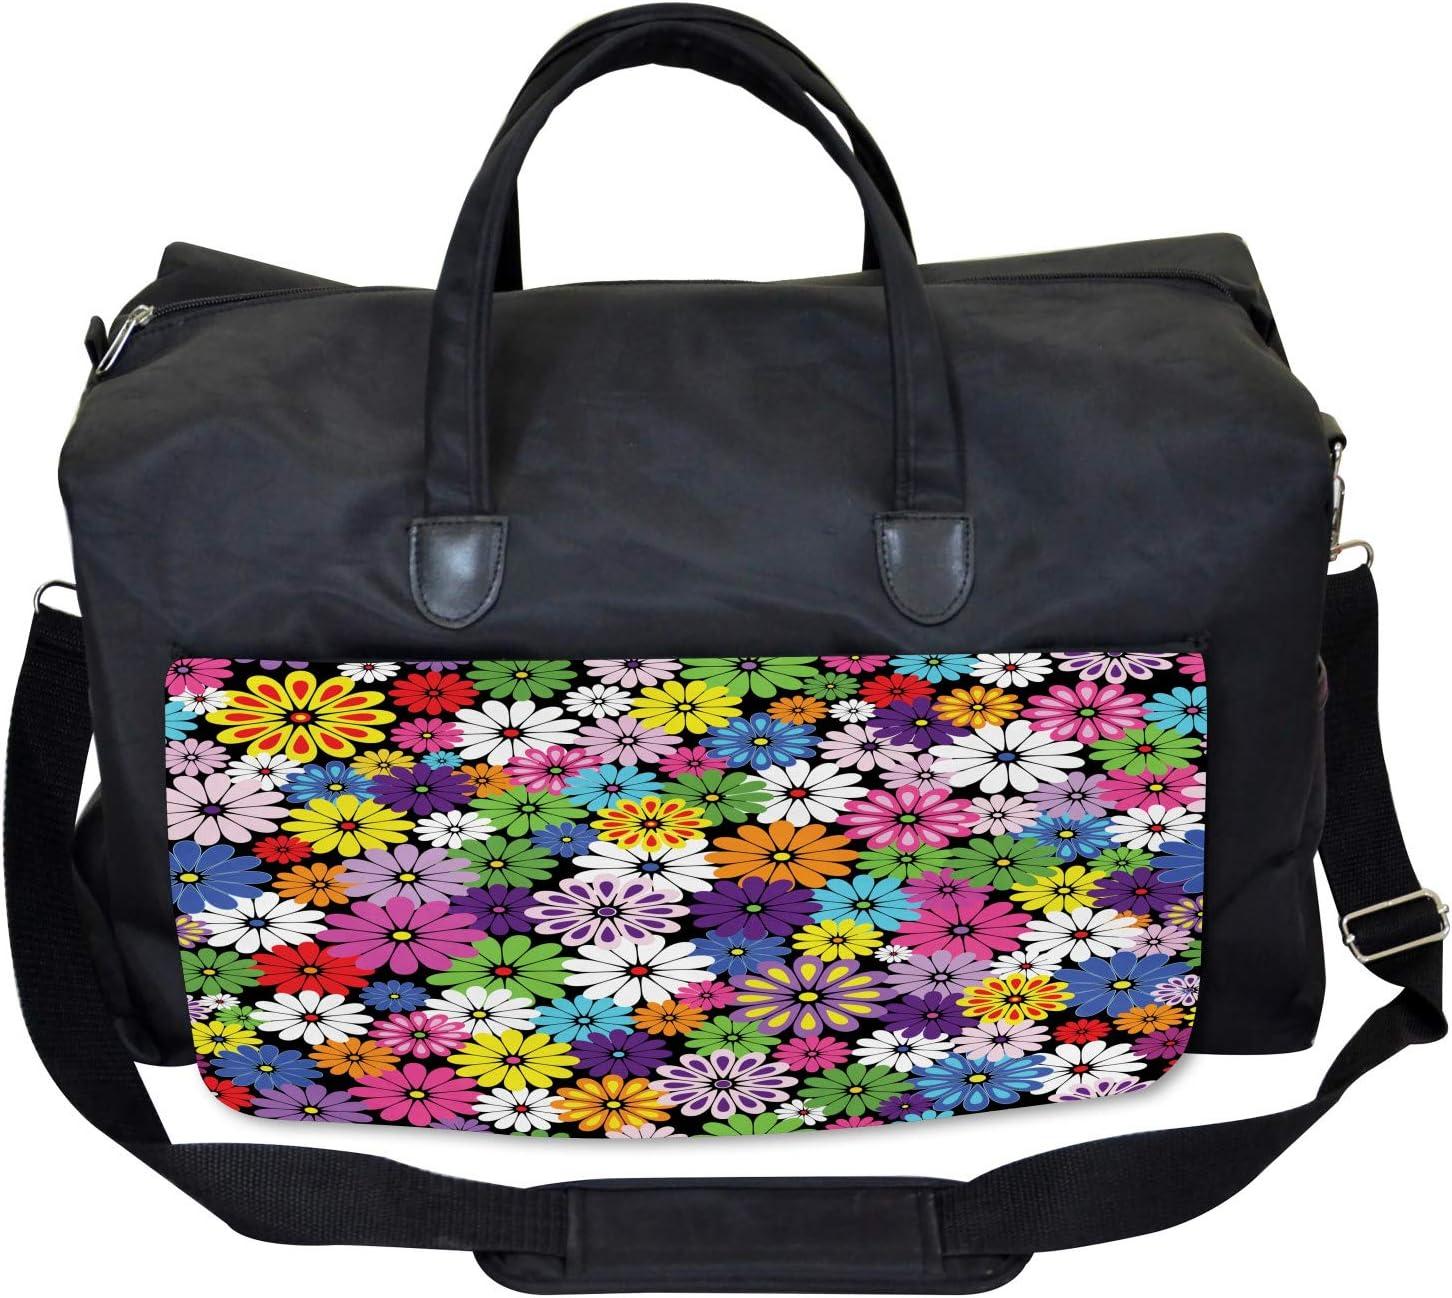 Ambesonne Colorful Gym Bag Large Weekender Carry-on Floral Vivid Daisies